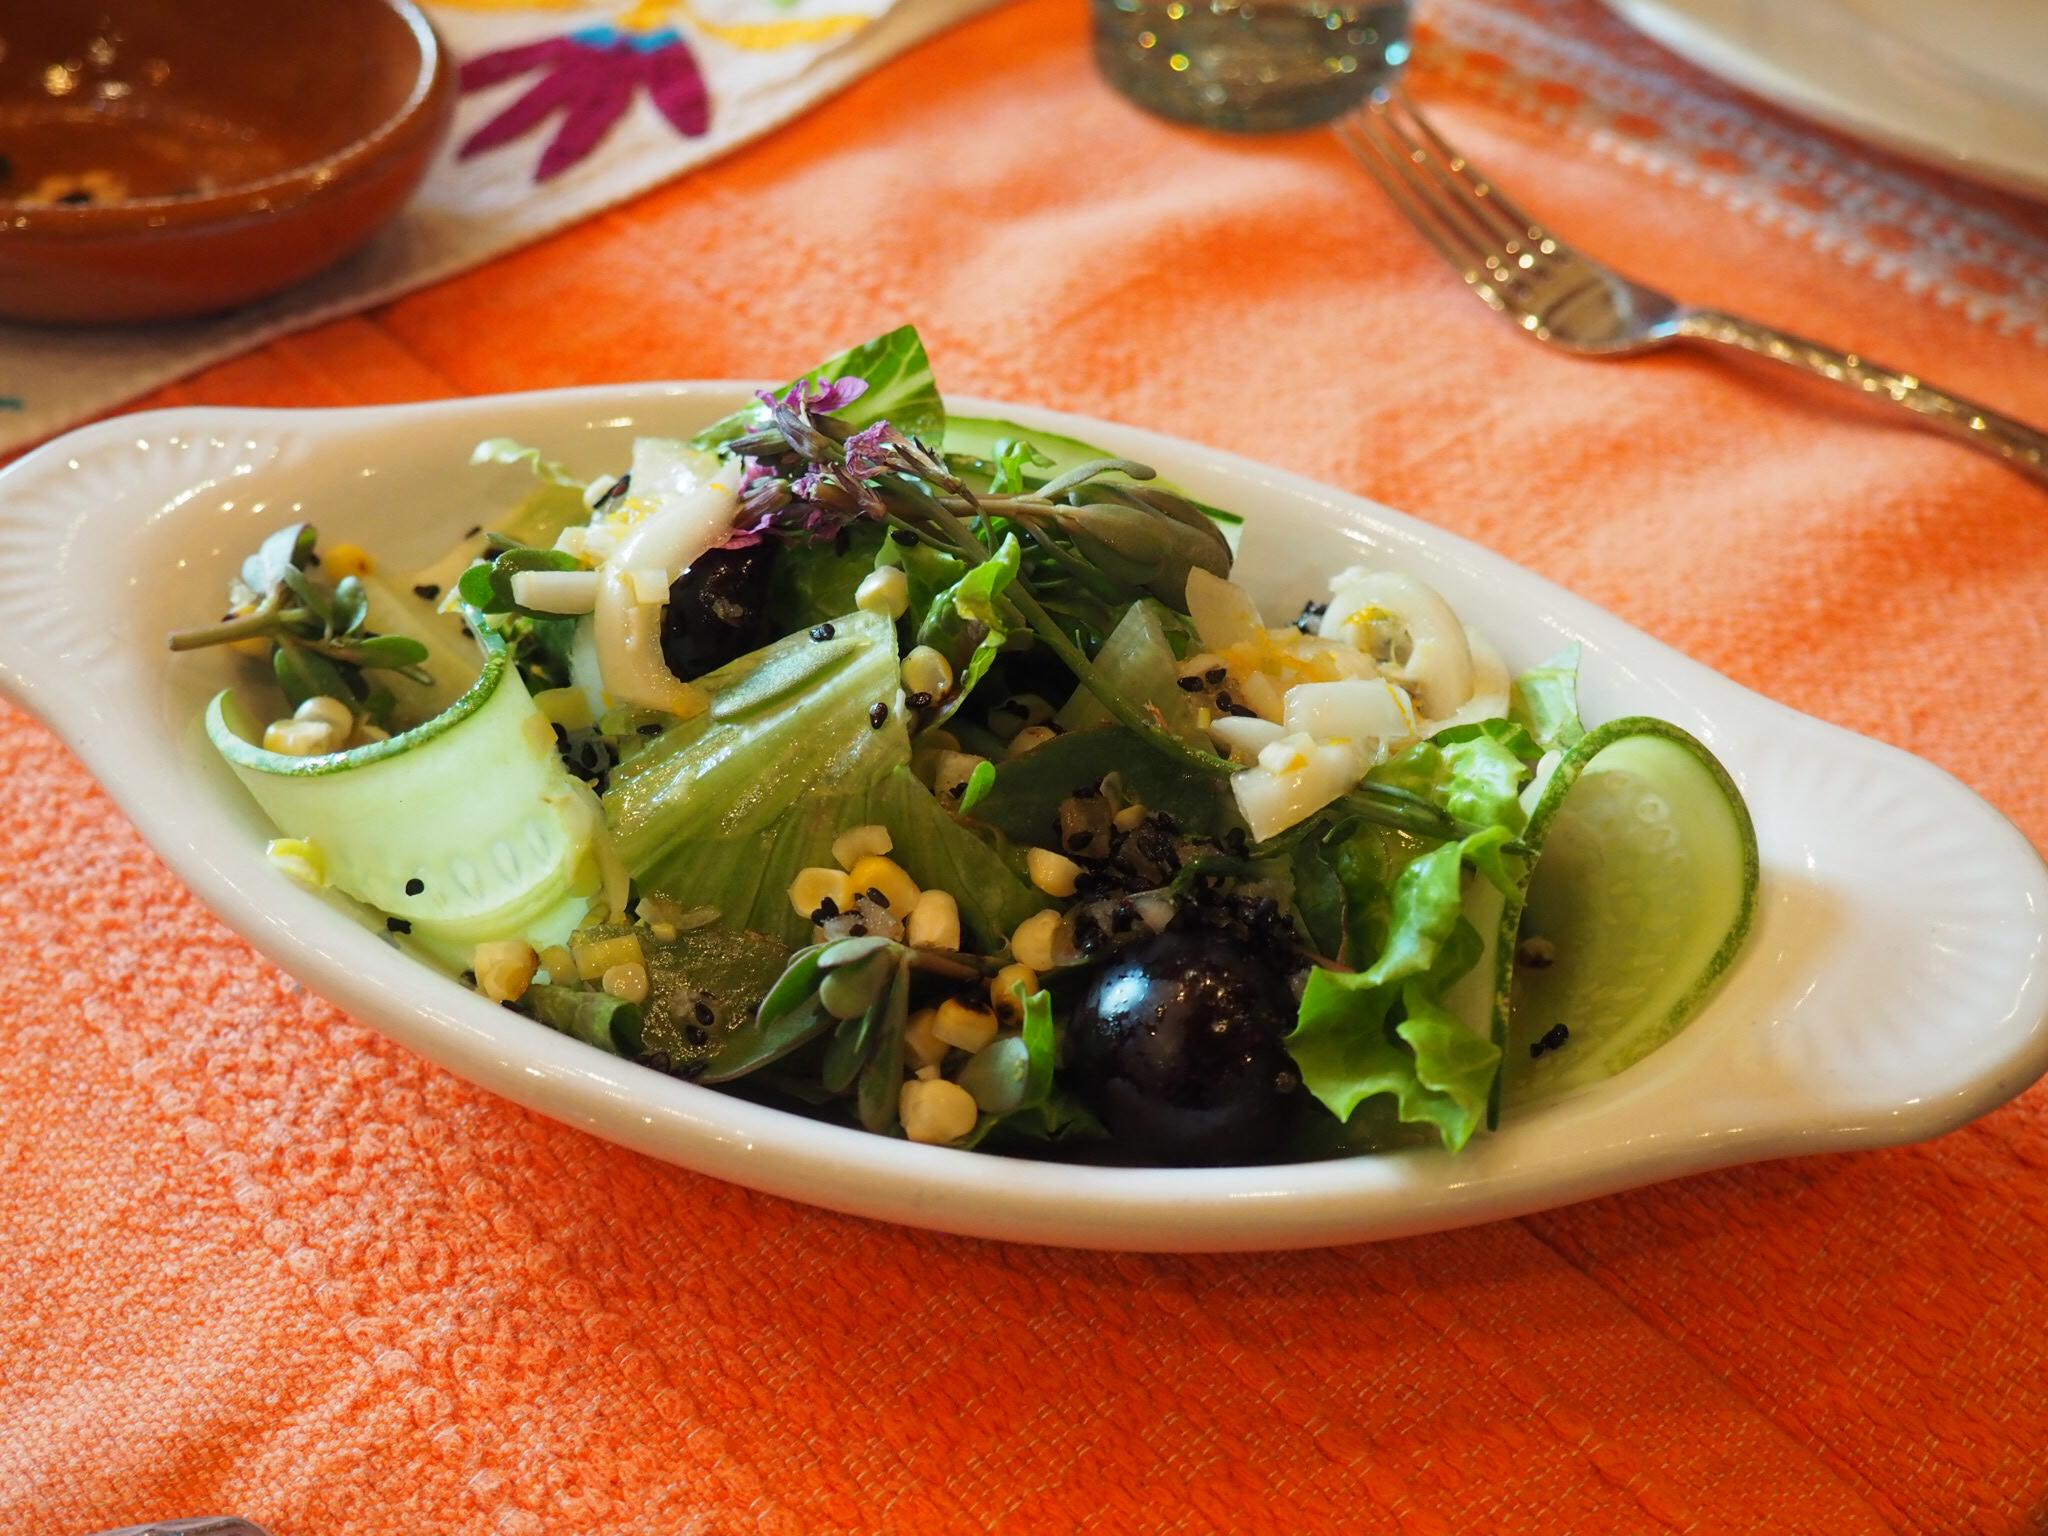 Garden salad. Photo by Jackie Bryant.